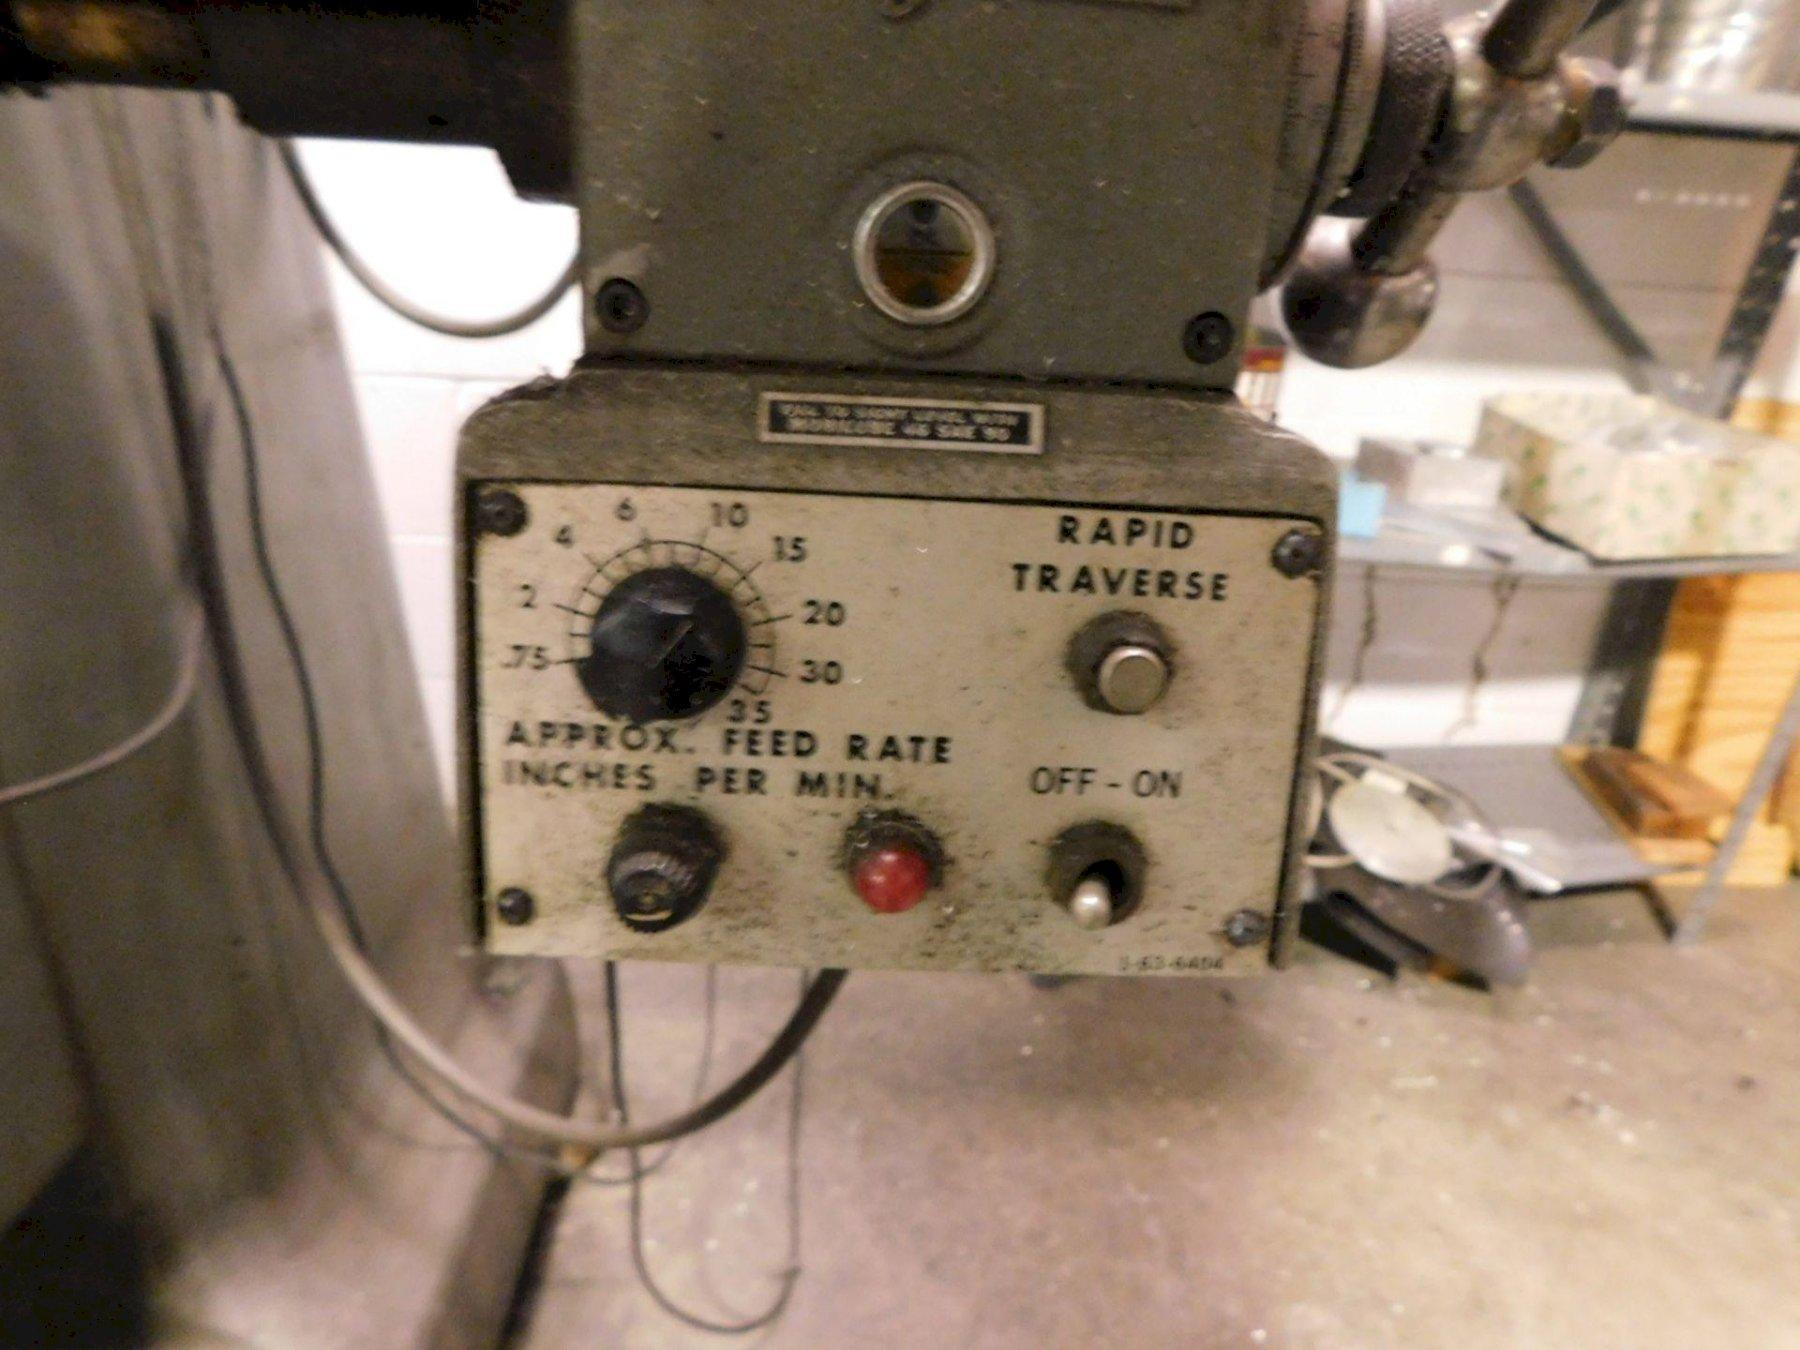 "BRIDGEPORT SERIES 1 VERTICAL KNEE MILL, 2-Axis Acu-Rite II DRO, 9"" x 48"" Table, Servo Power Table Feed, 2 HP Motor, 500-4200 RPM, New 1980."